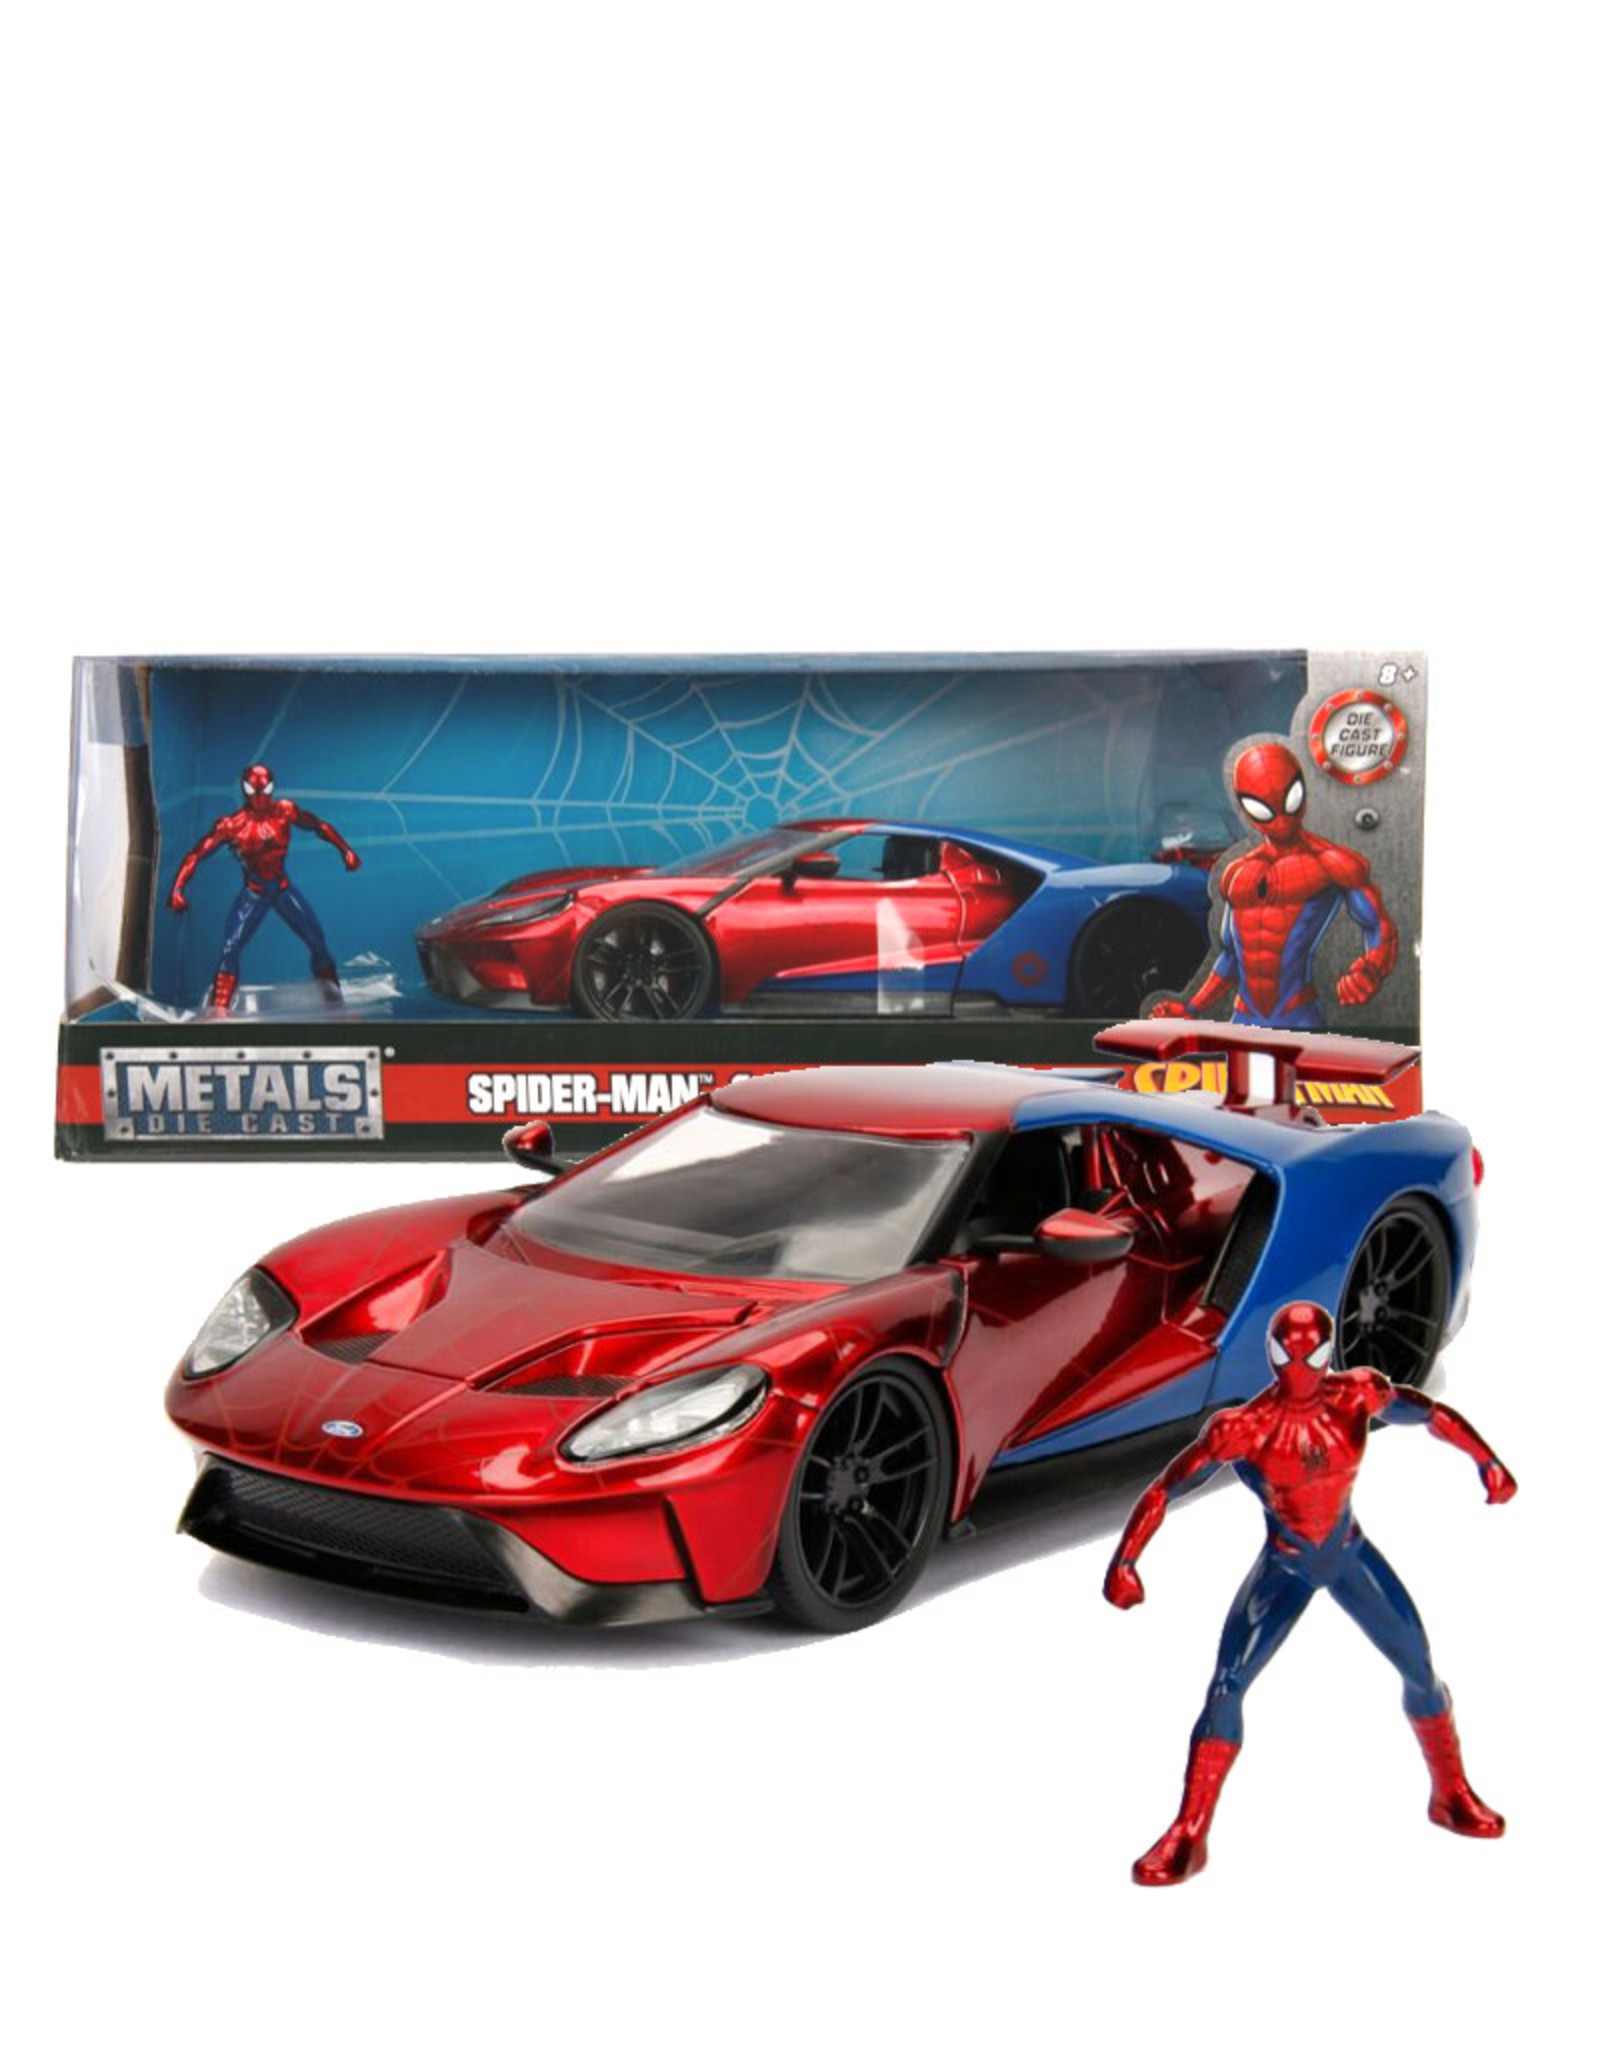 Spider-man ( Voiture de collection en métal 1:24 ) Ford GT